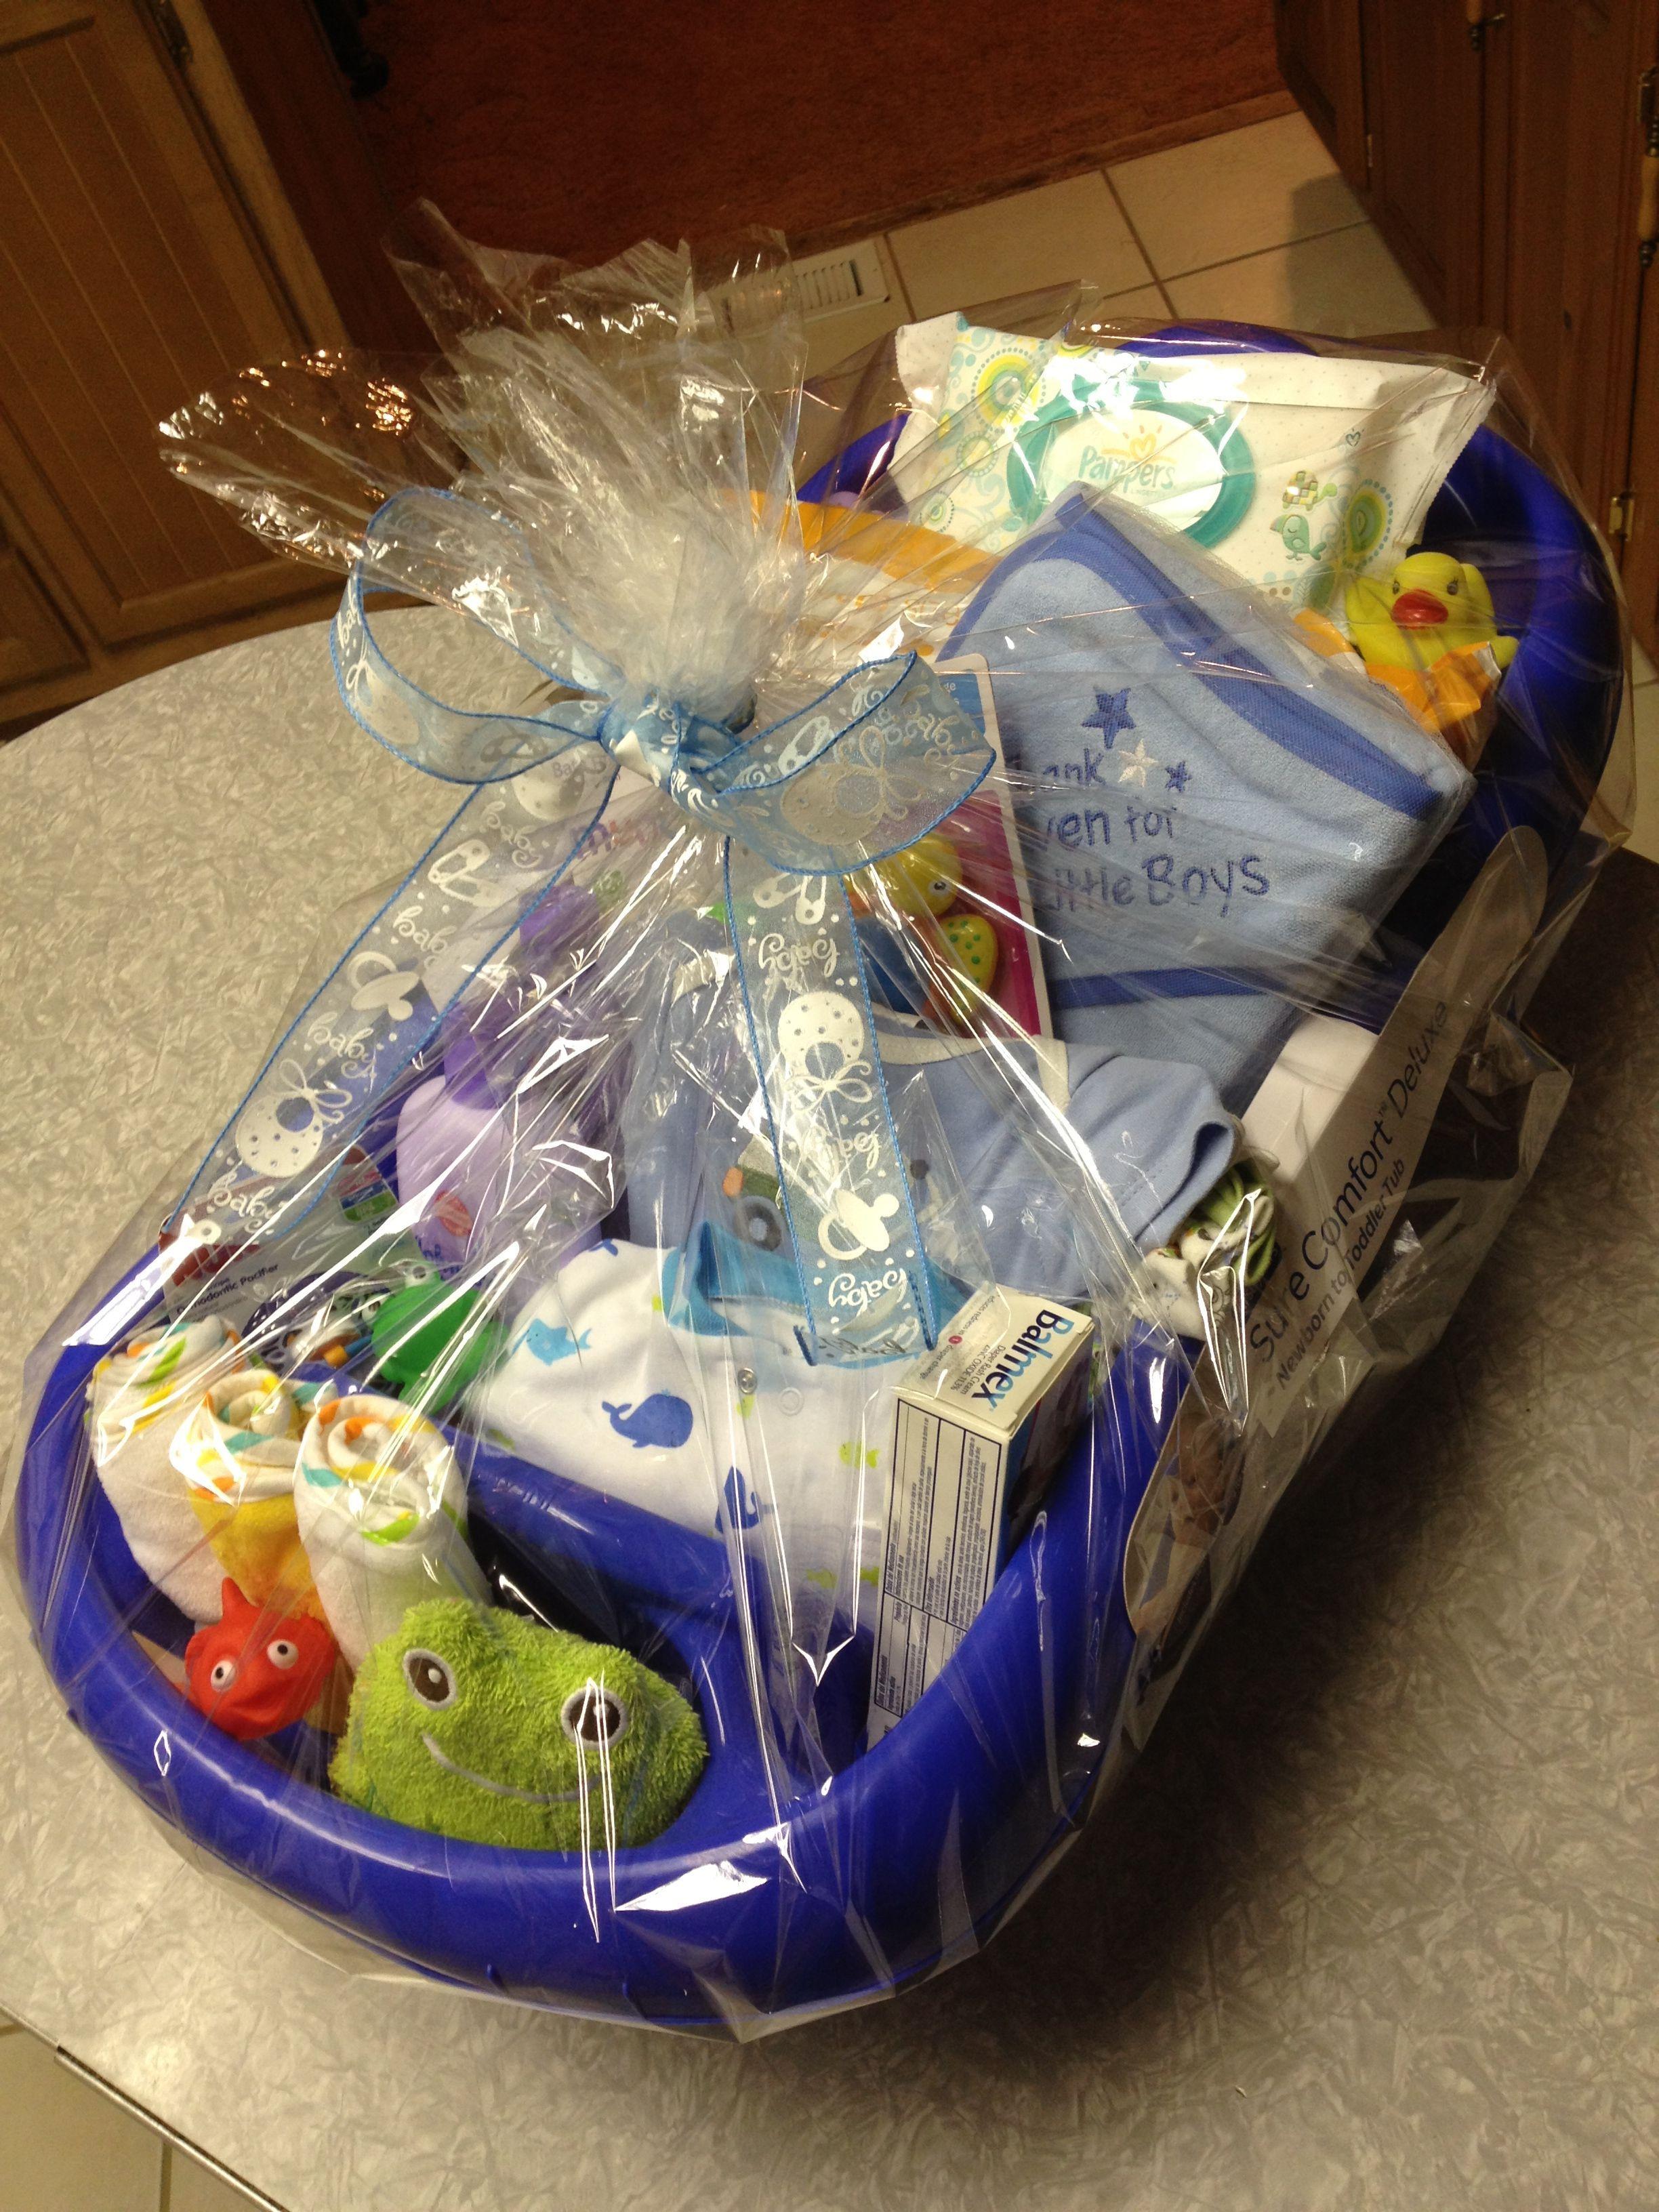 Baby boy bathtub gift basket | Home Decor in 2018 | Pinterest ...